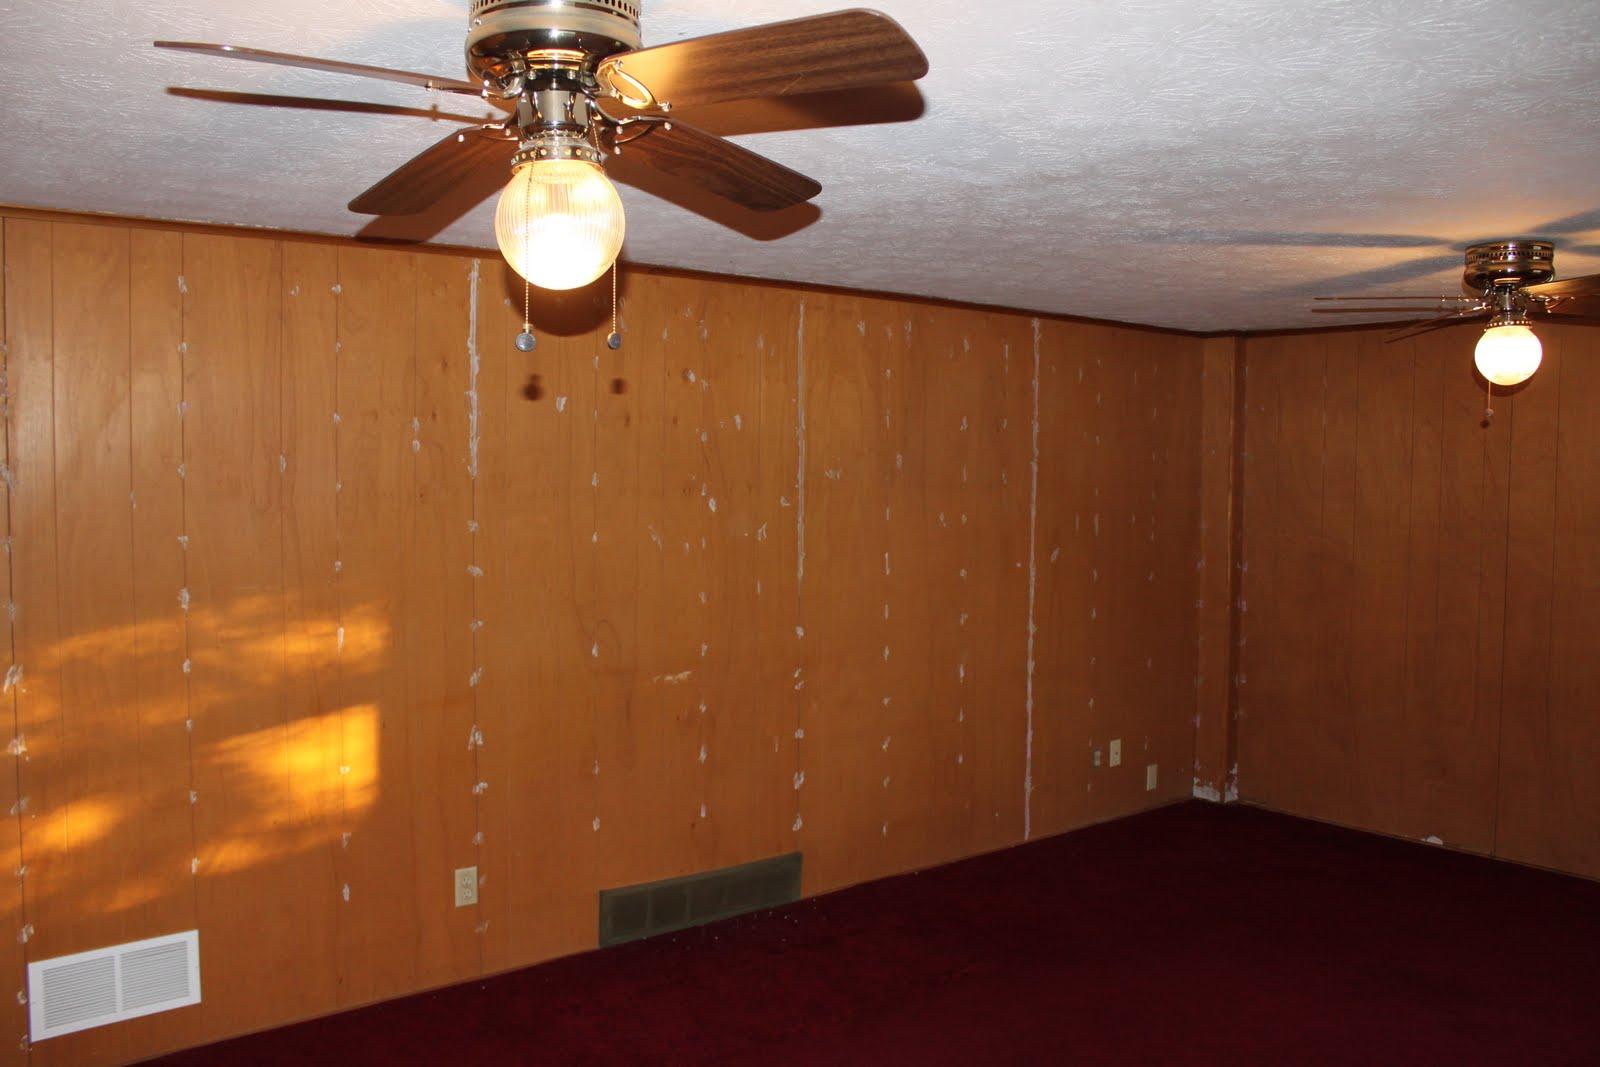 Basement Ceiling Fan : Schenk sightings year later family room basement